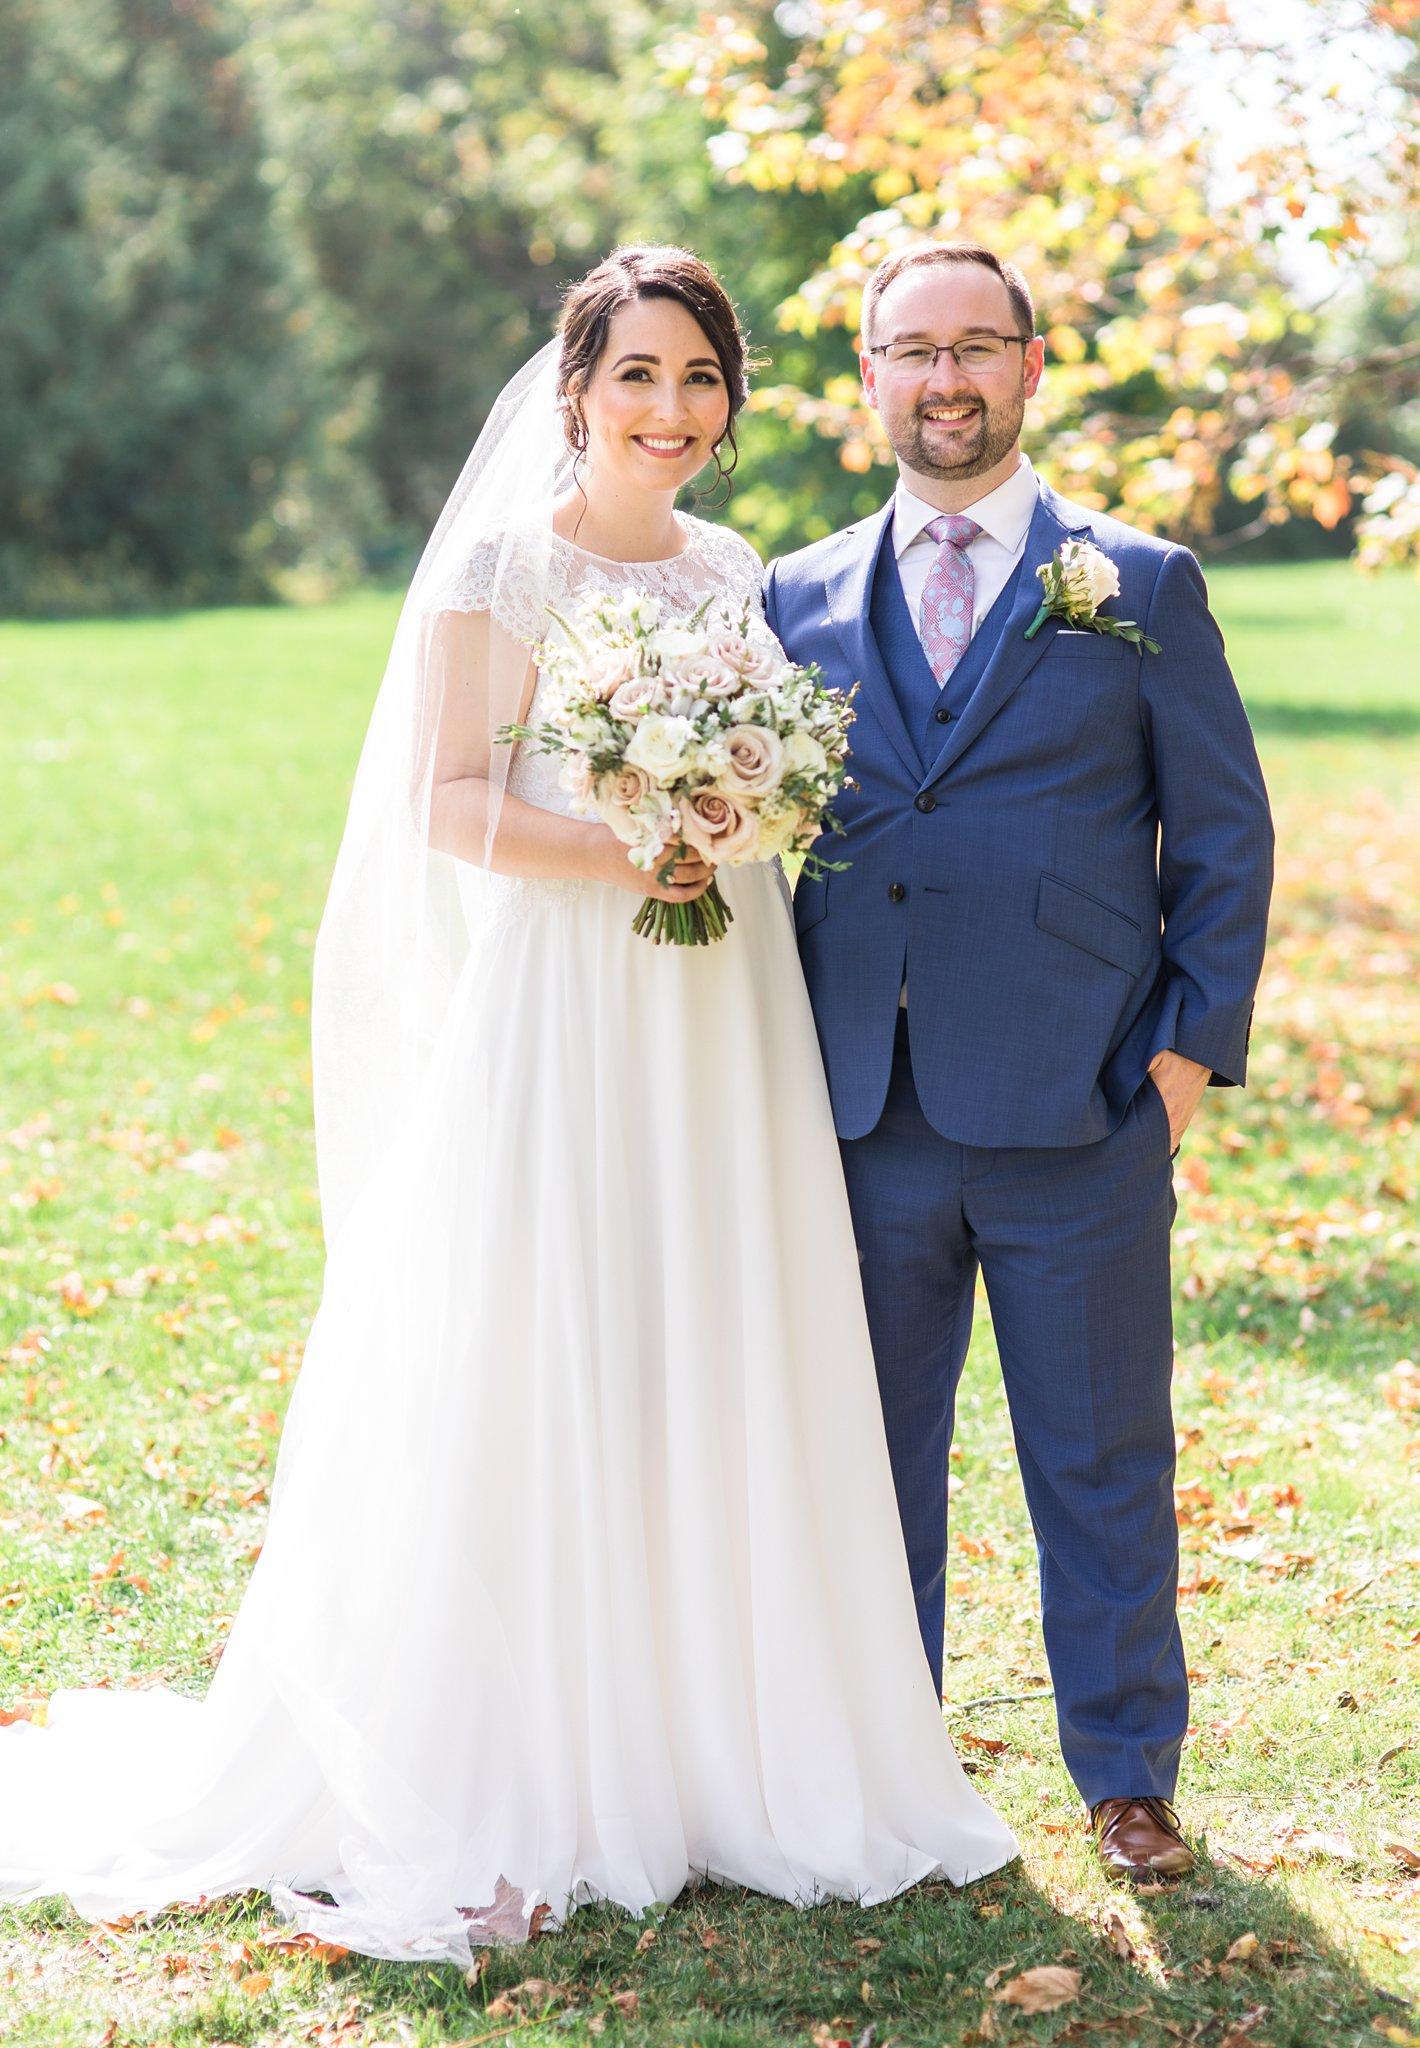 Arboretum wedding photos, Britannia Yacht Club Wedding Photos, Amy Pinder Photography